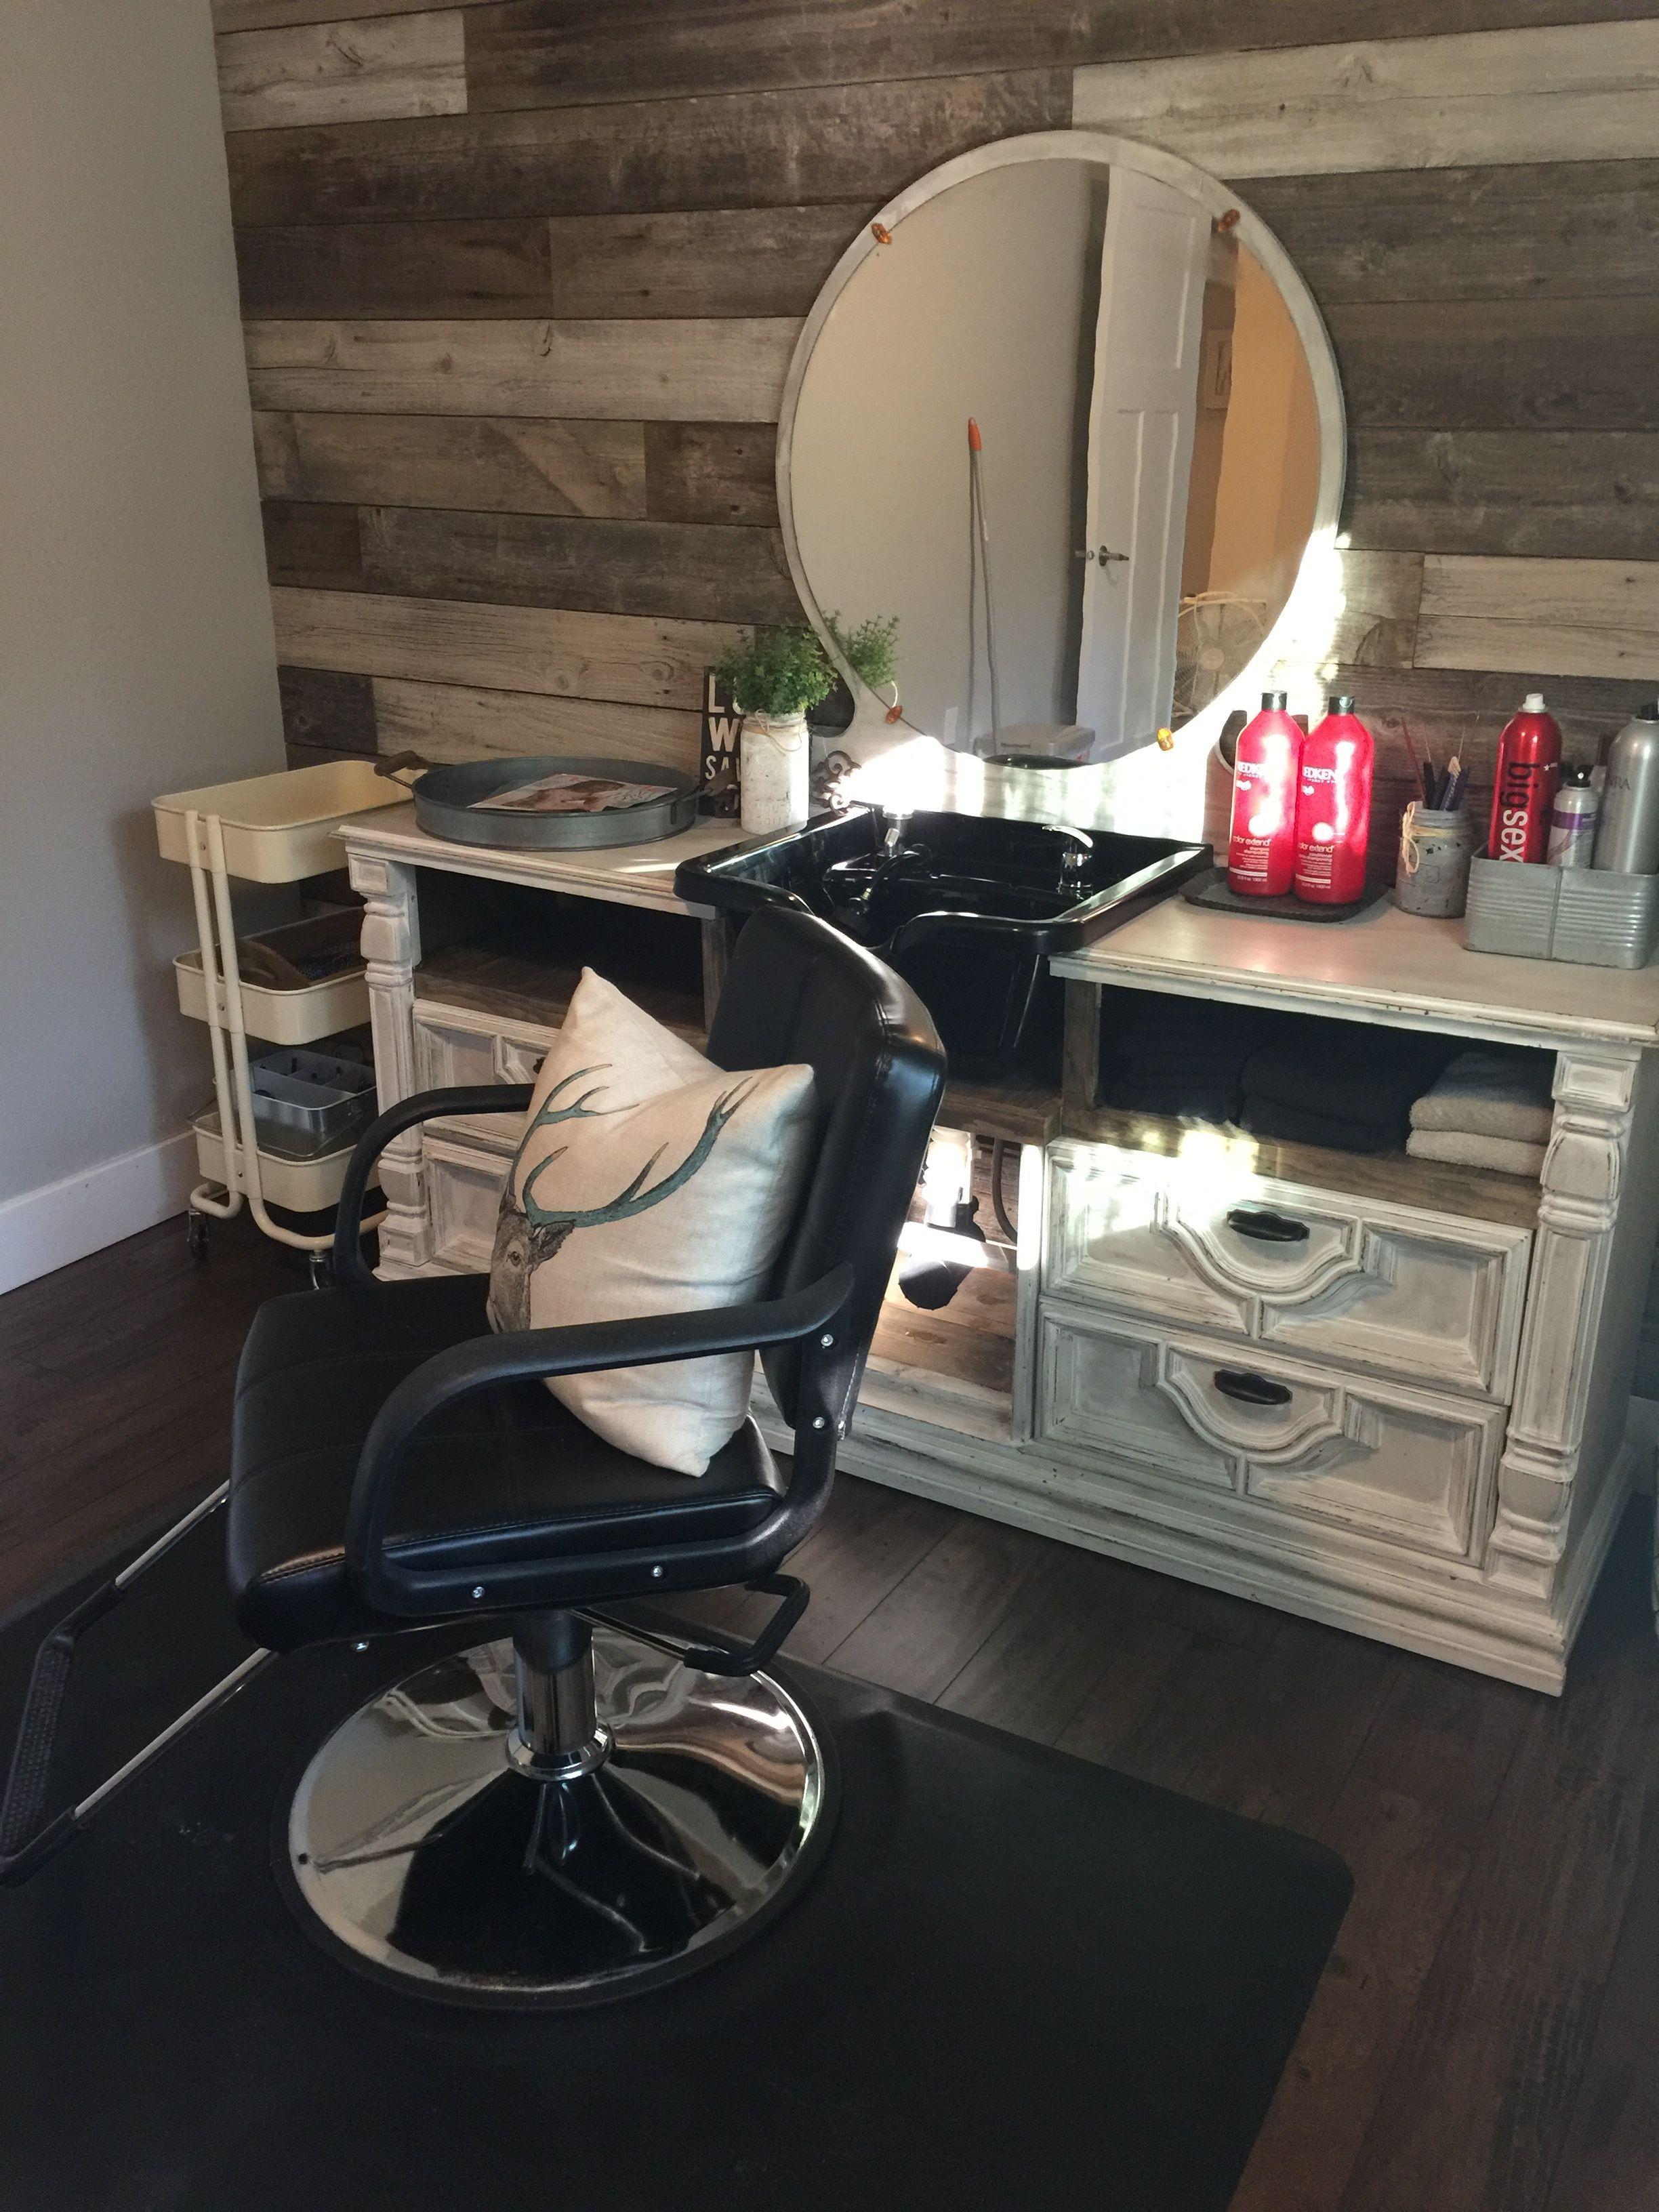 Diy Shampoo Bowl In Dresser Home Salon In 2020 Home Hair Salons Salon Suites Decor Home Beauty Salon